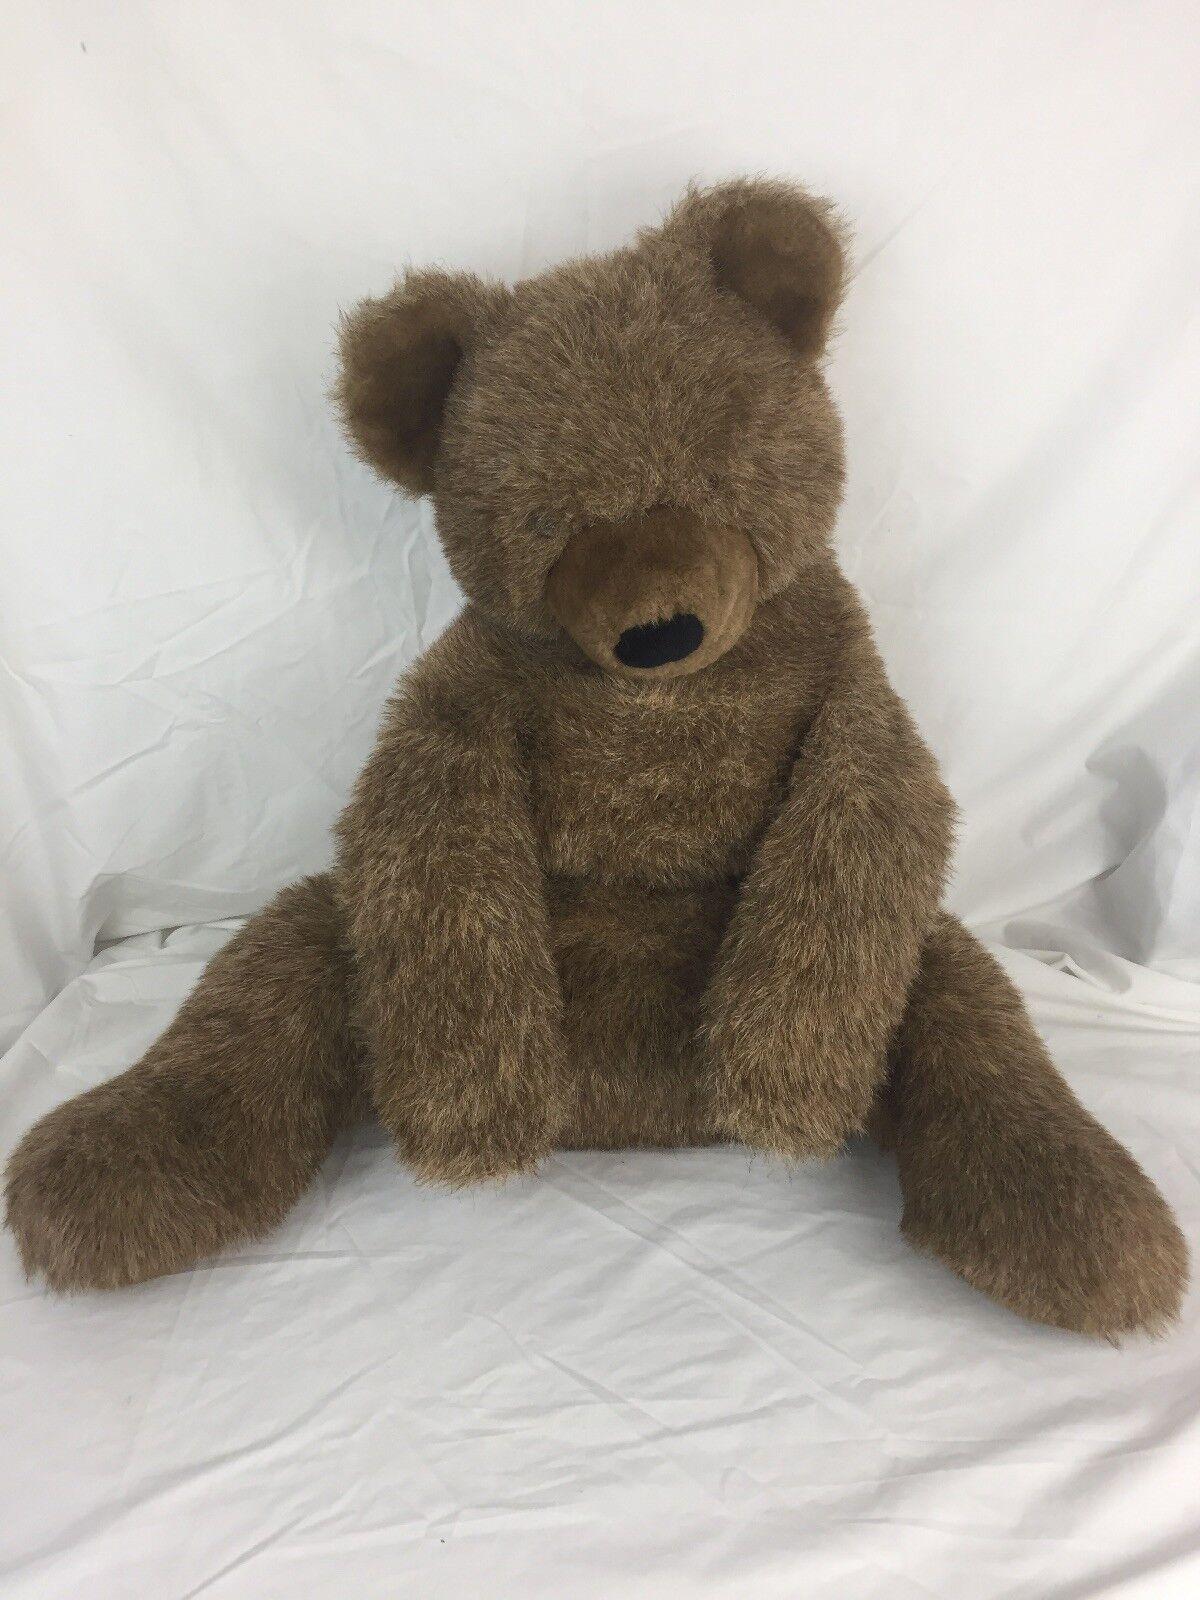 "Vintage Gund Teddy Bear Collectors Classic Marronee Large Plush Stuffed 25"" Sitting"